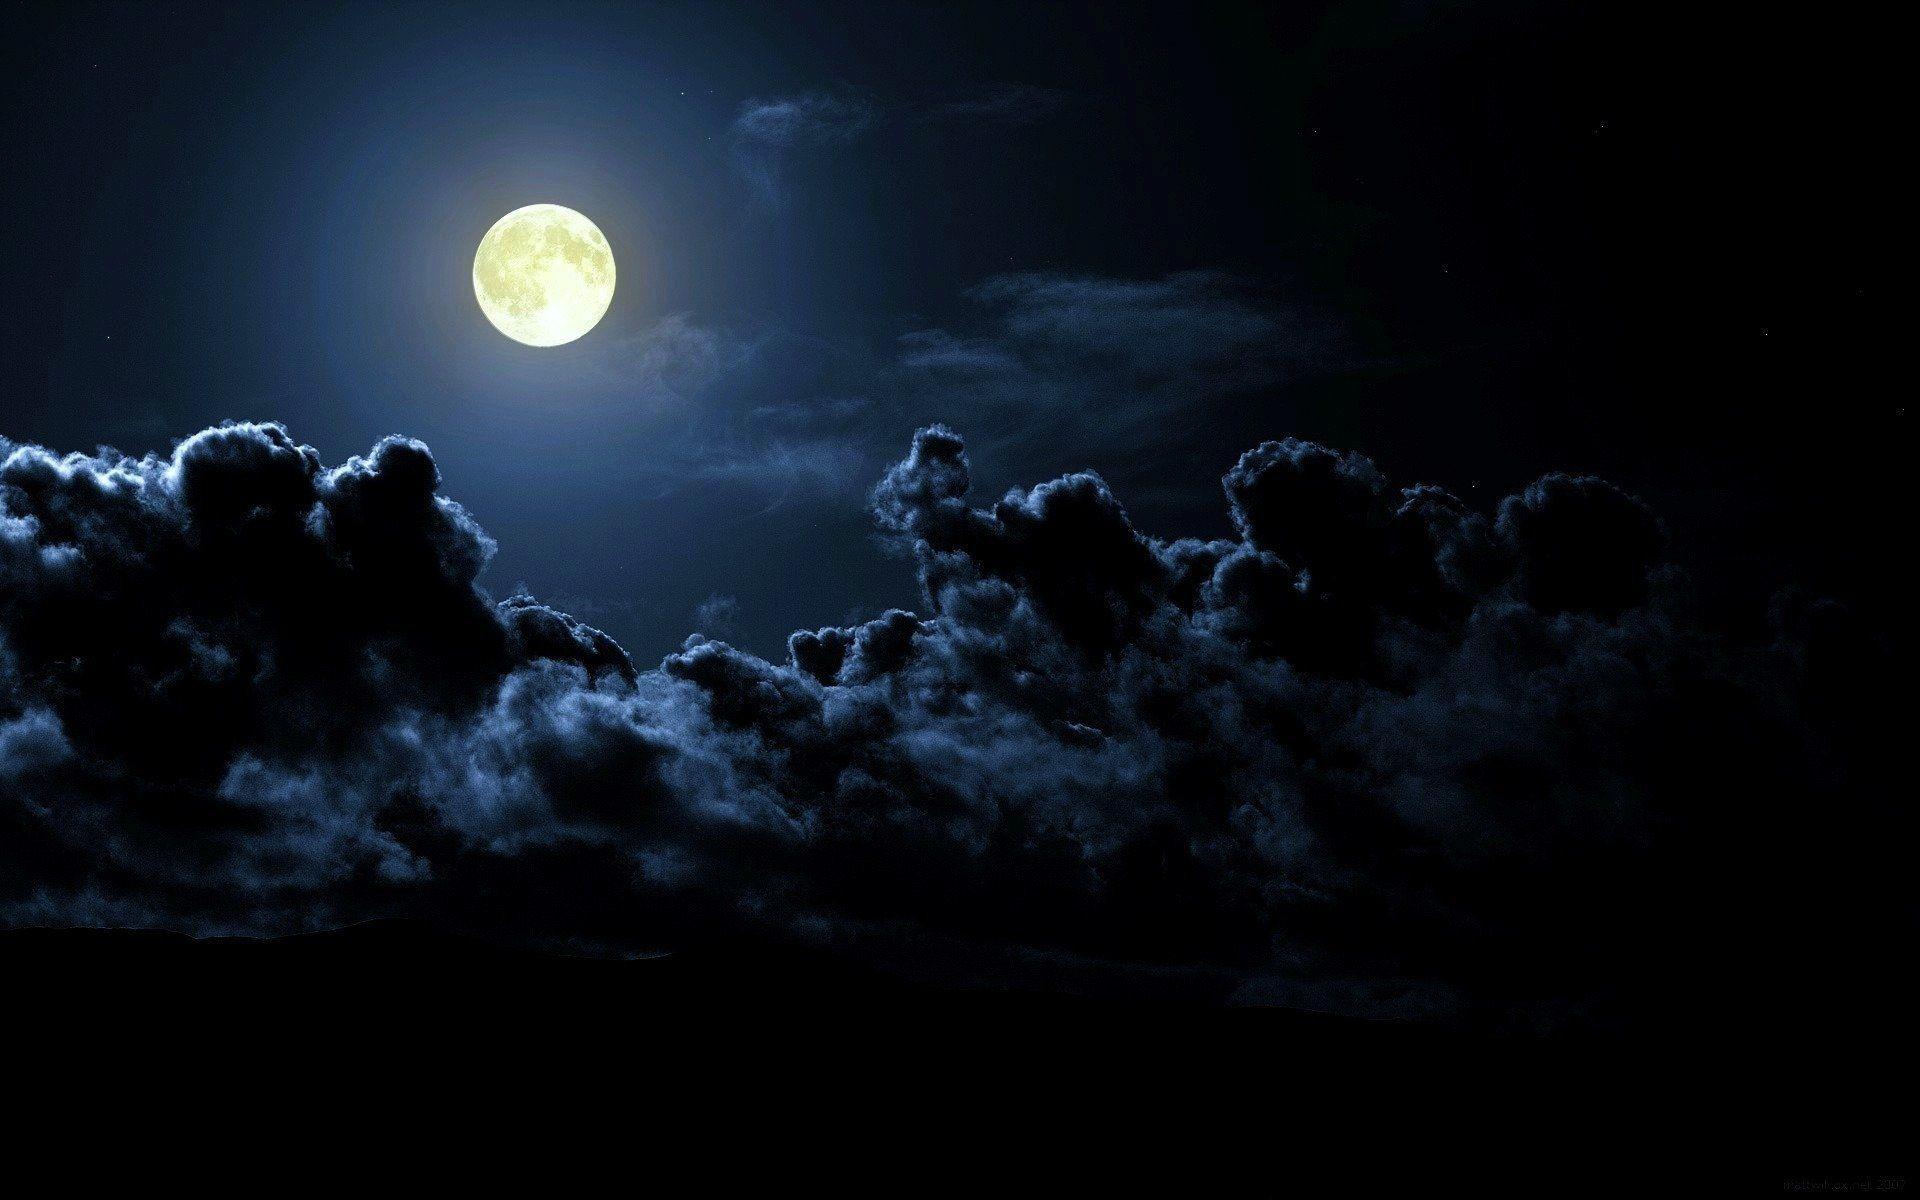 Clouds Night Moon Hd Wallpaper Night Life In 2018 Pinterest